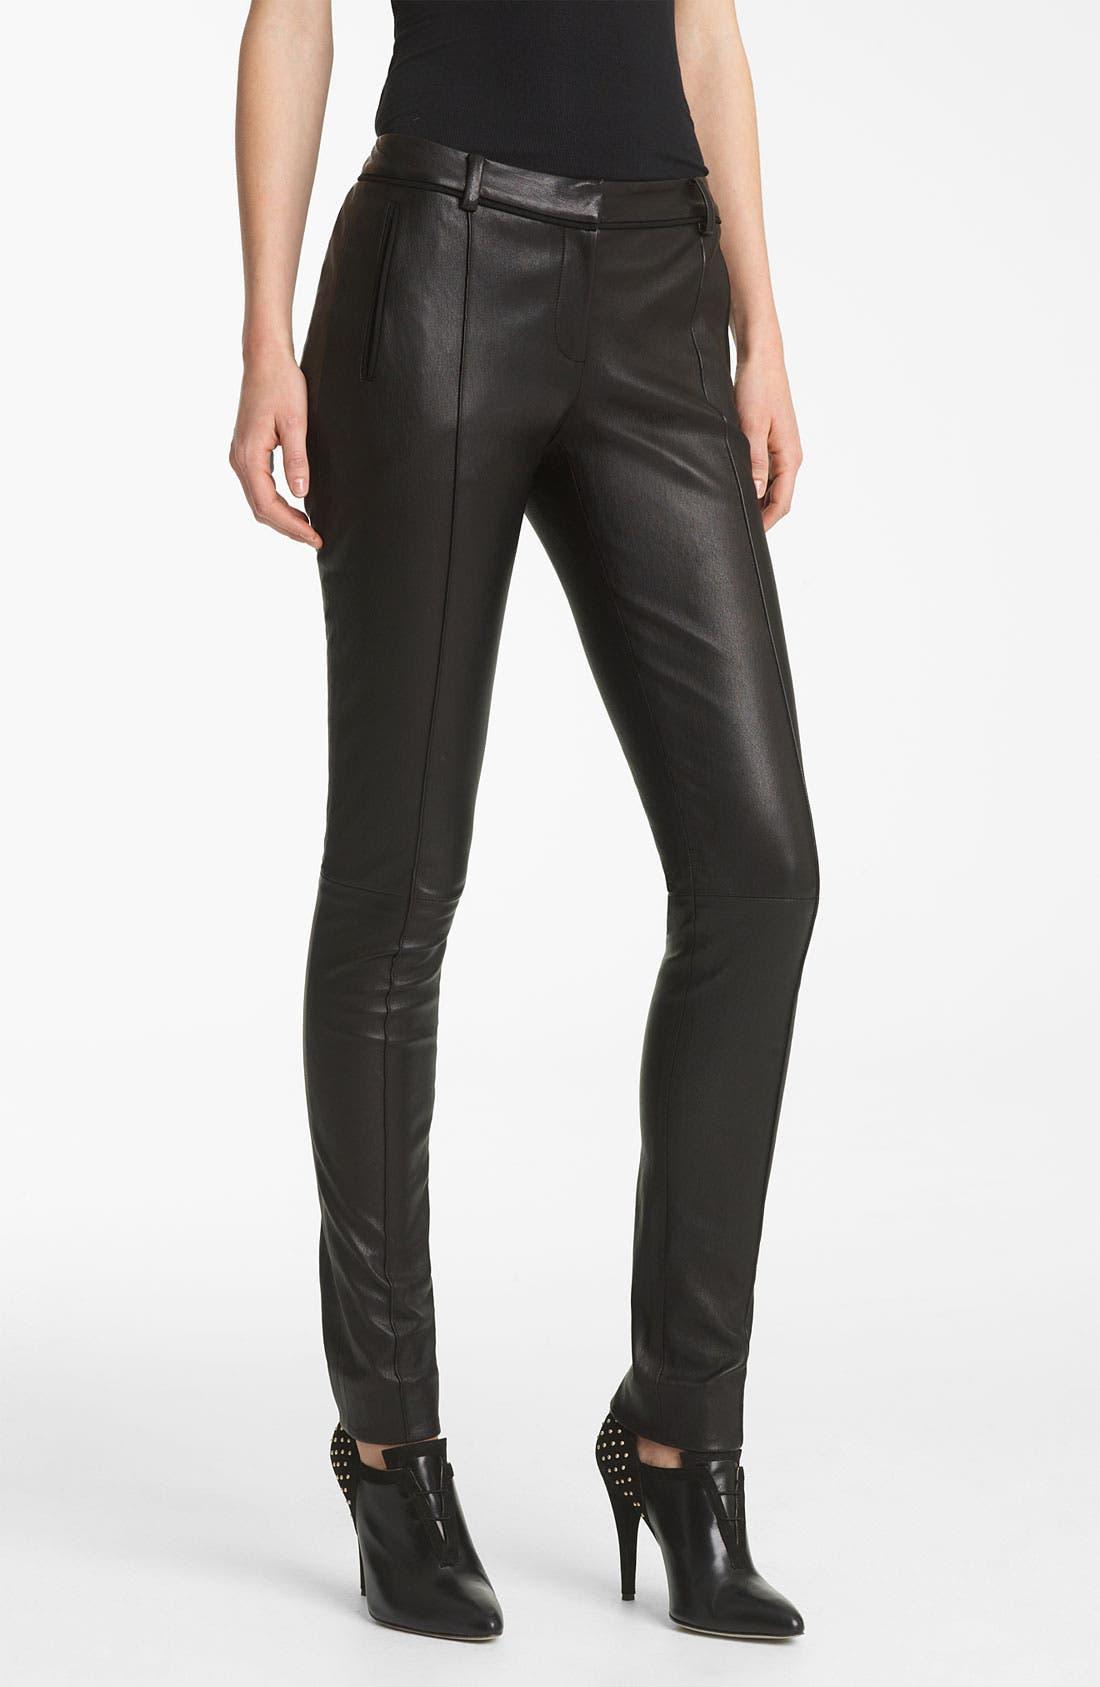 Alternate Image 1 Selected - Jason Wu Stovepipe Leather Pants